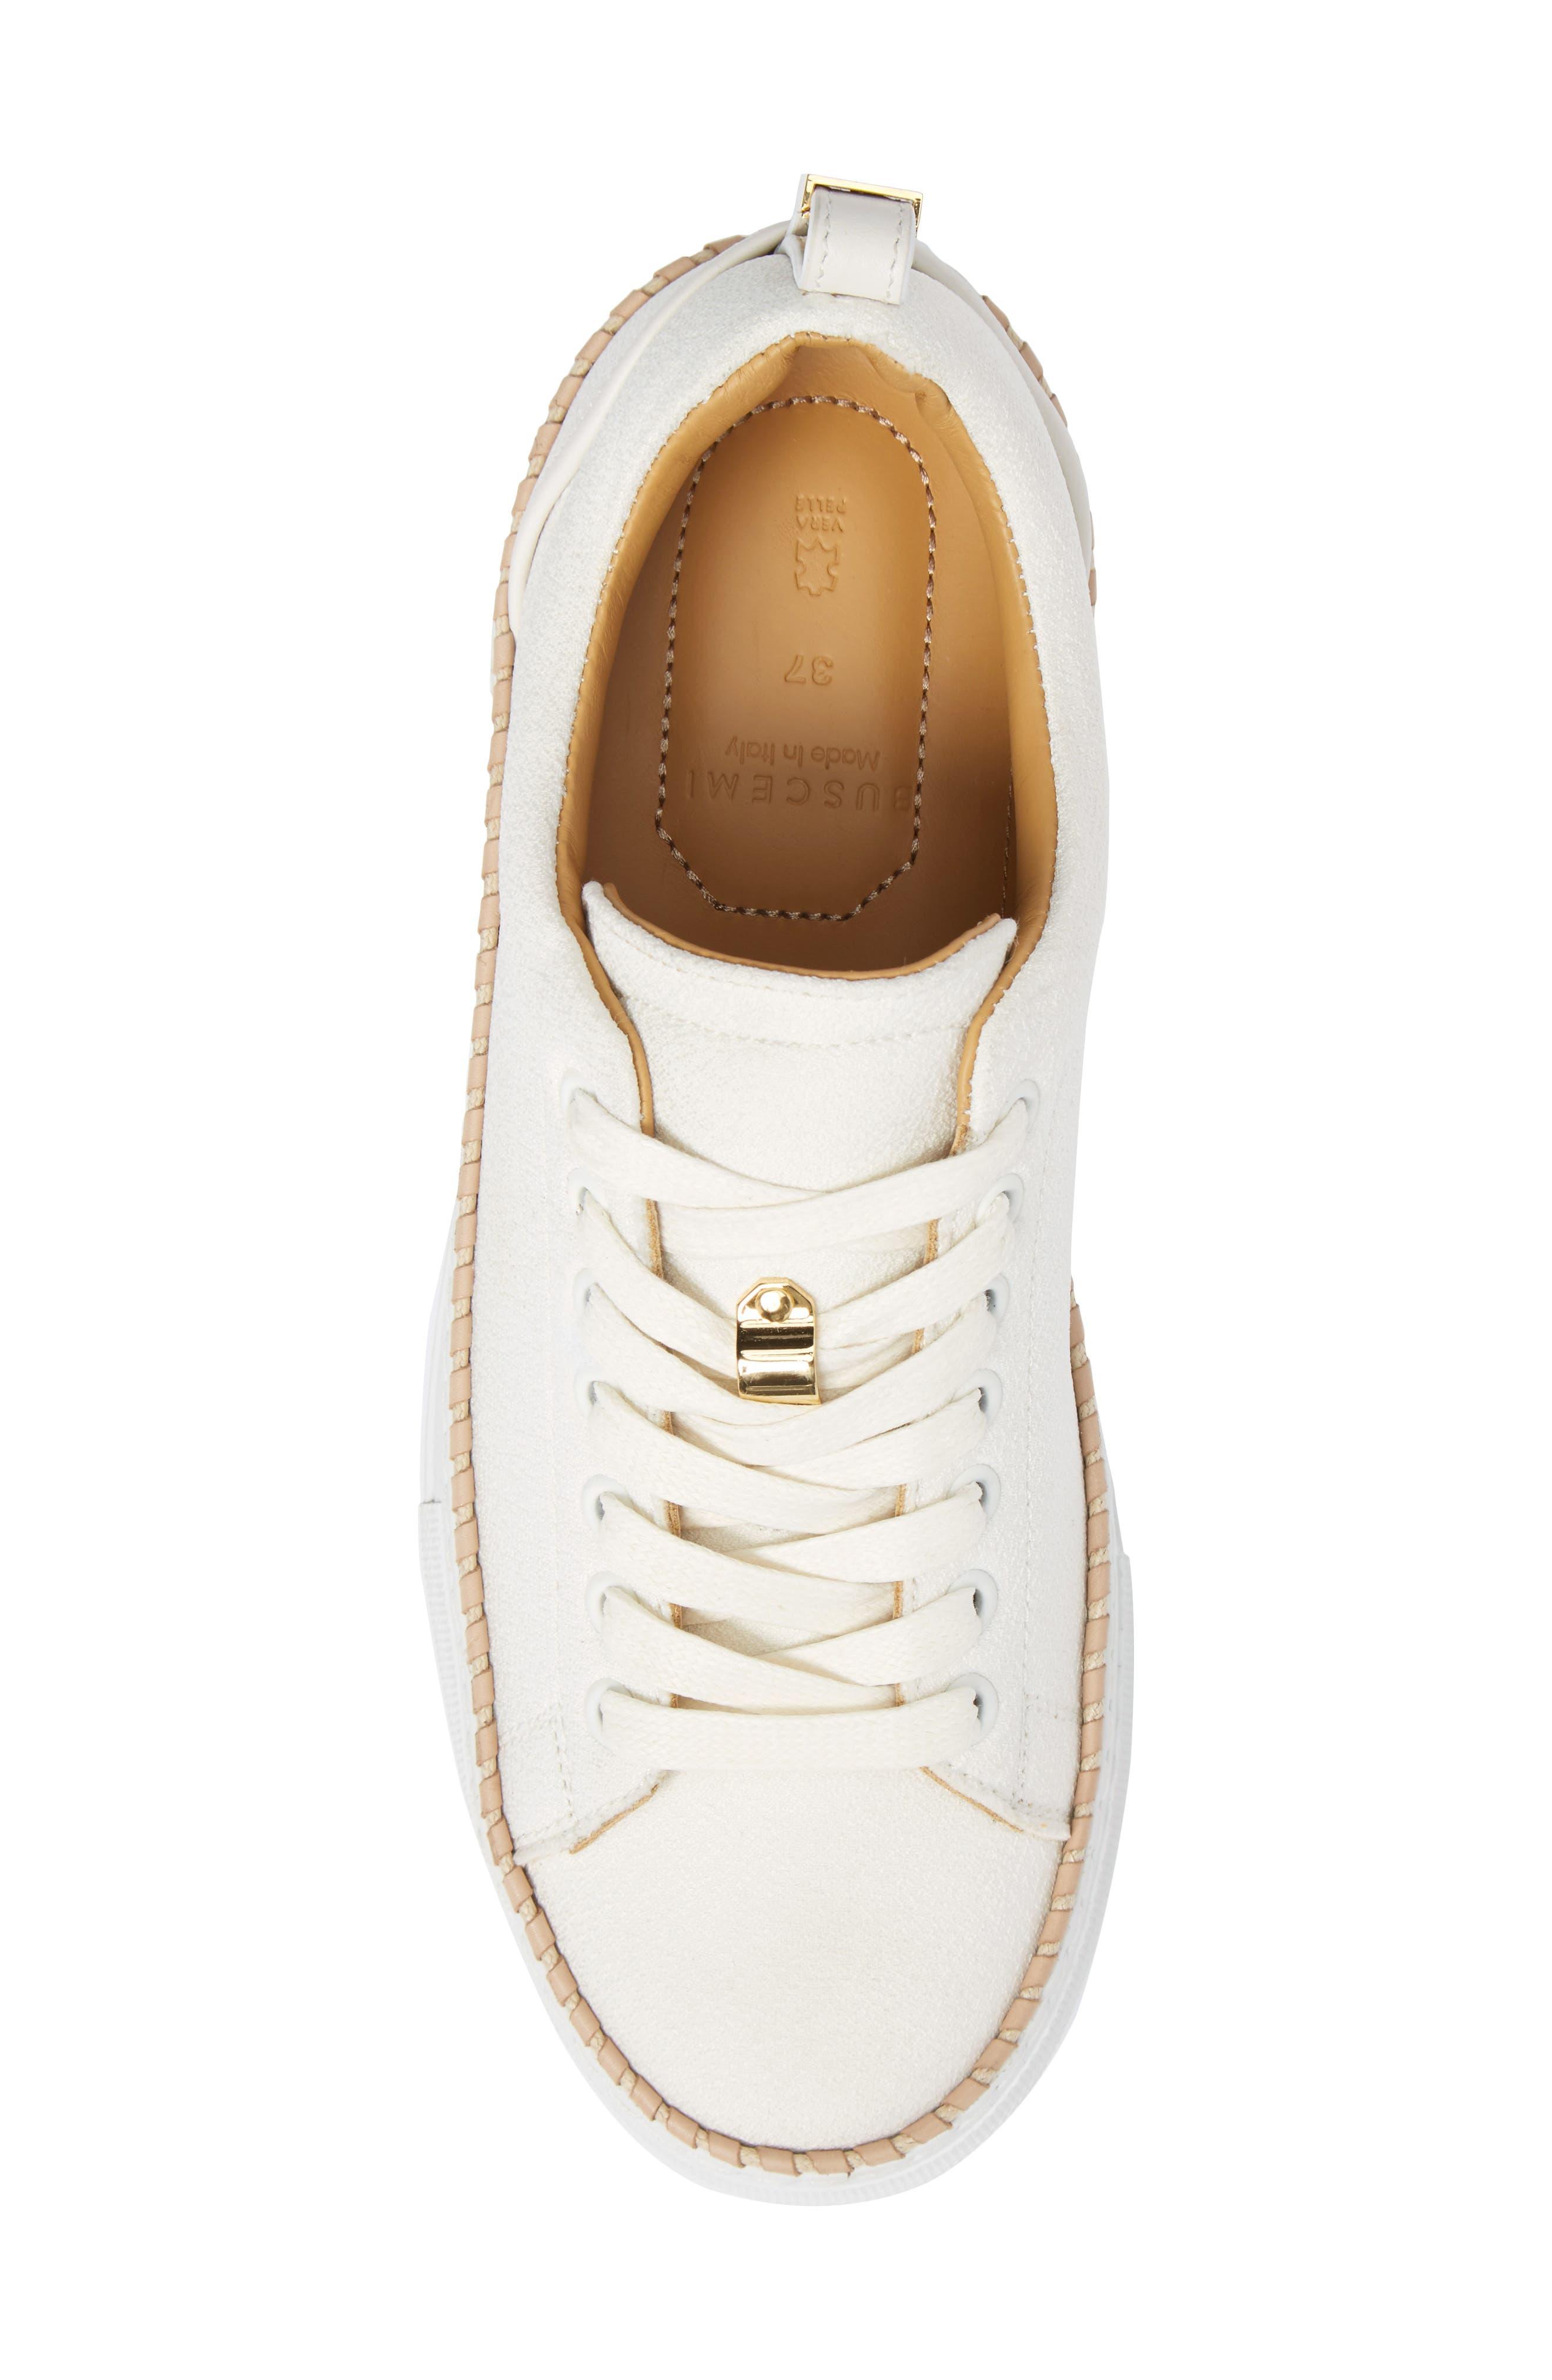 Tennis Crepone Sneaker,                             Alternate thumbnail 5, color,                             900